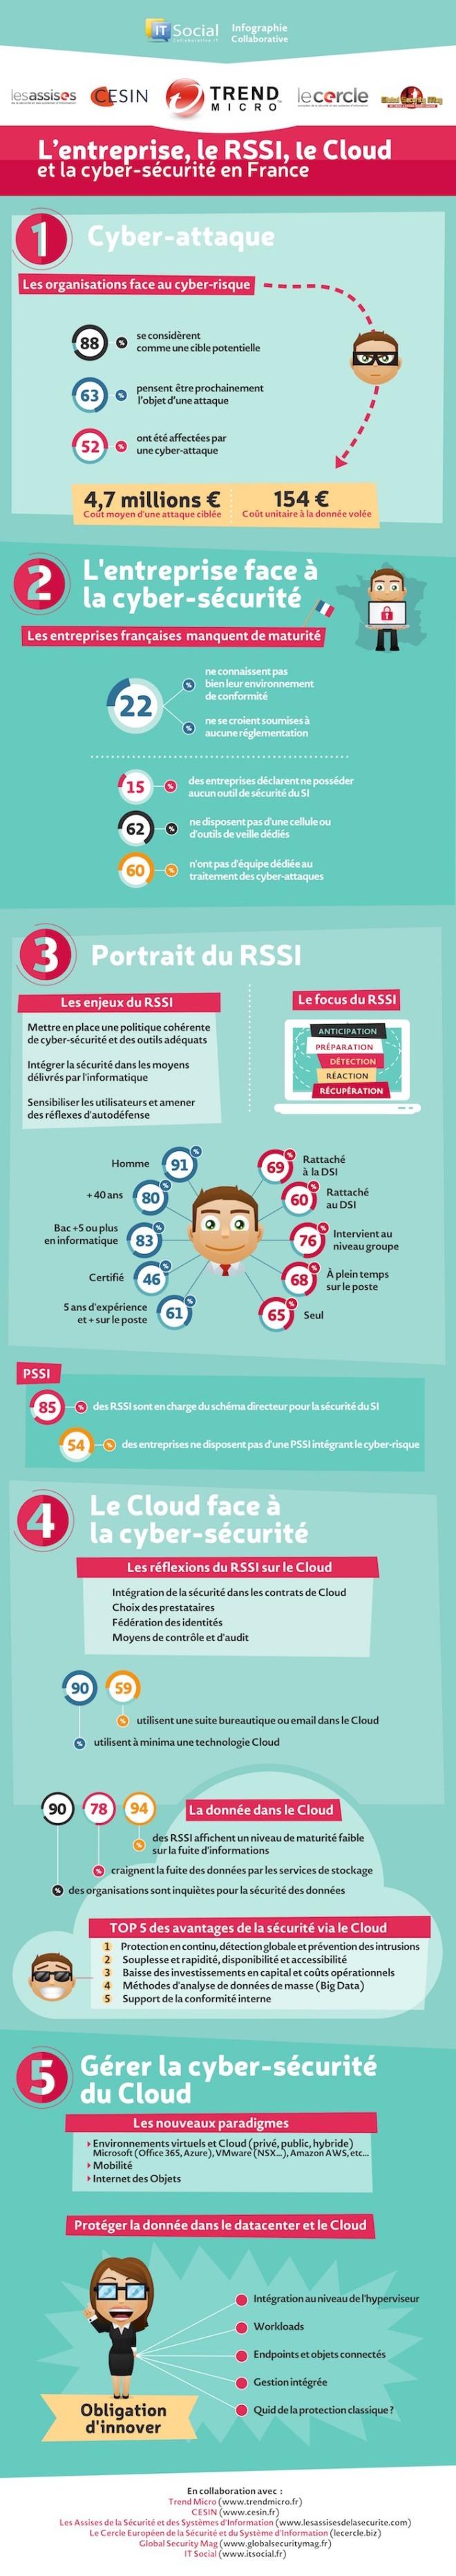 InfographieAssises-2015-Web-V4